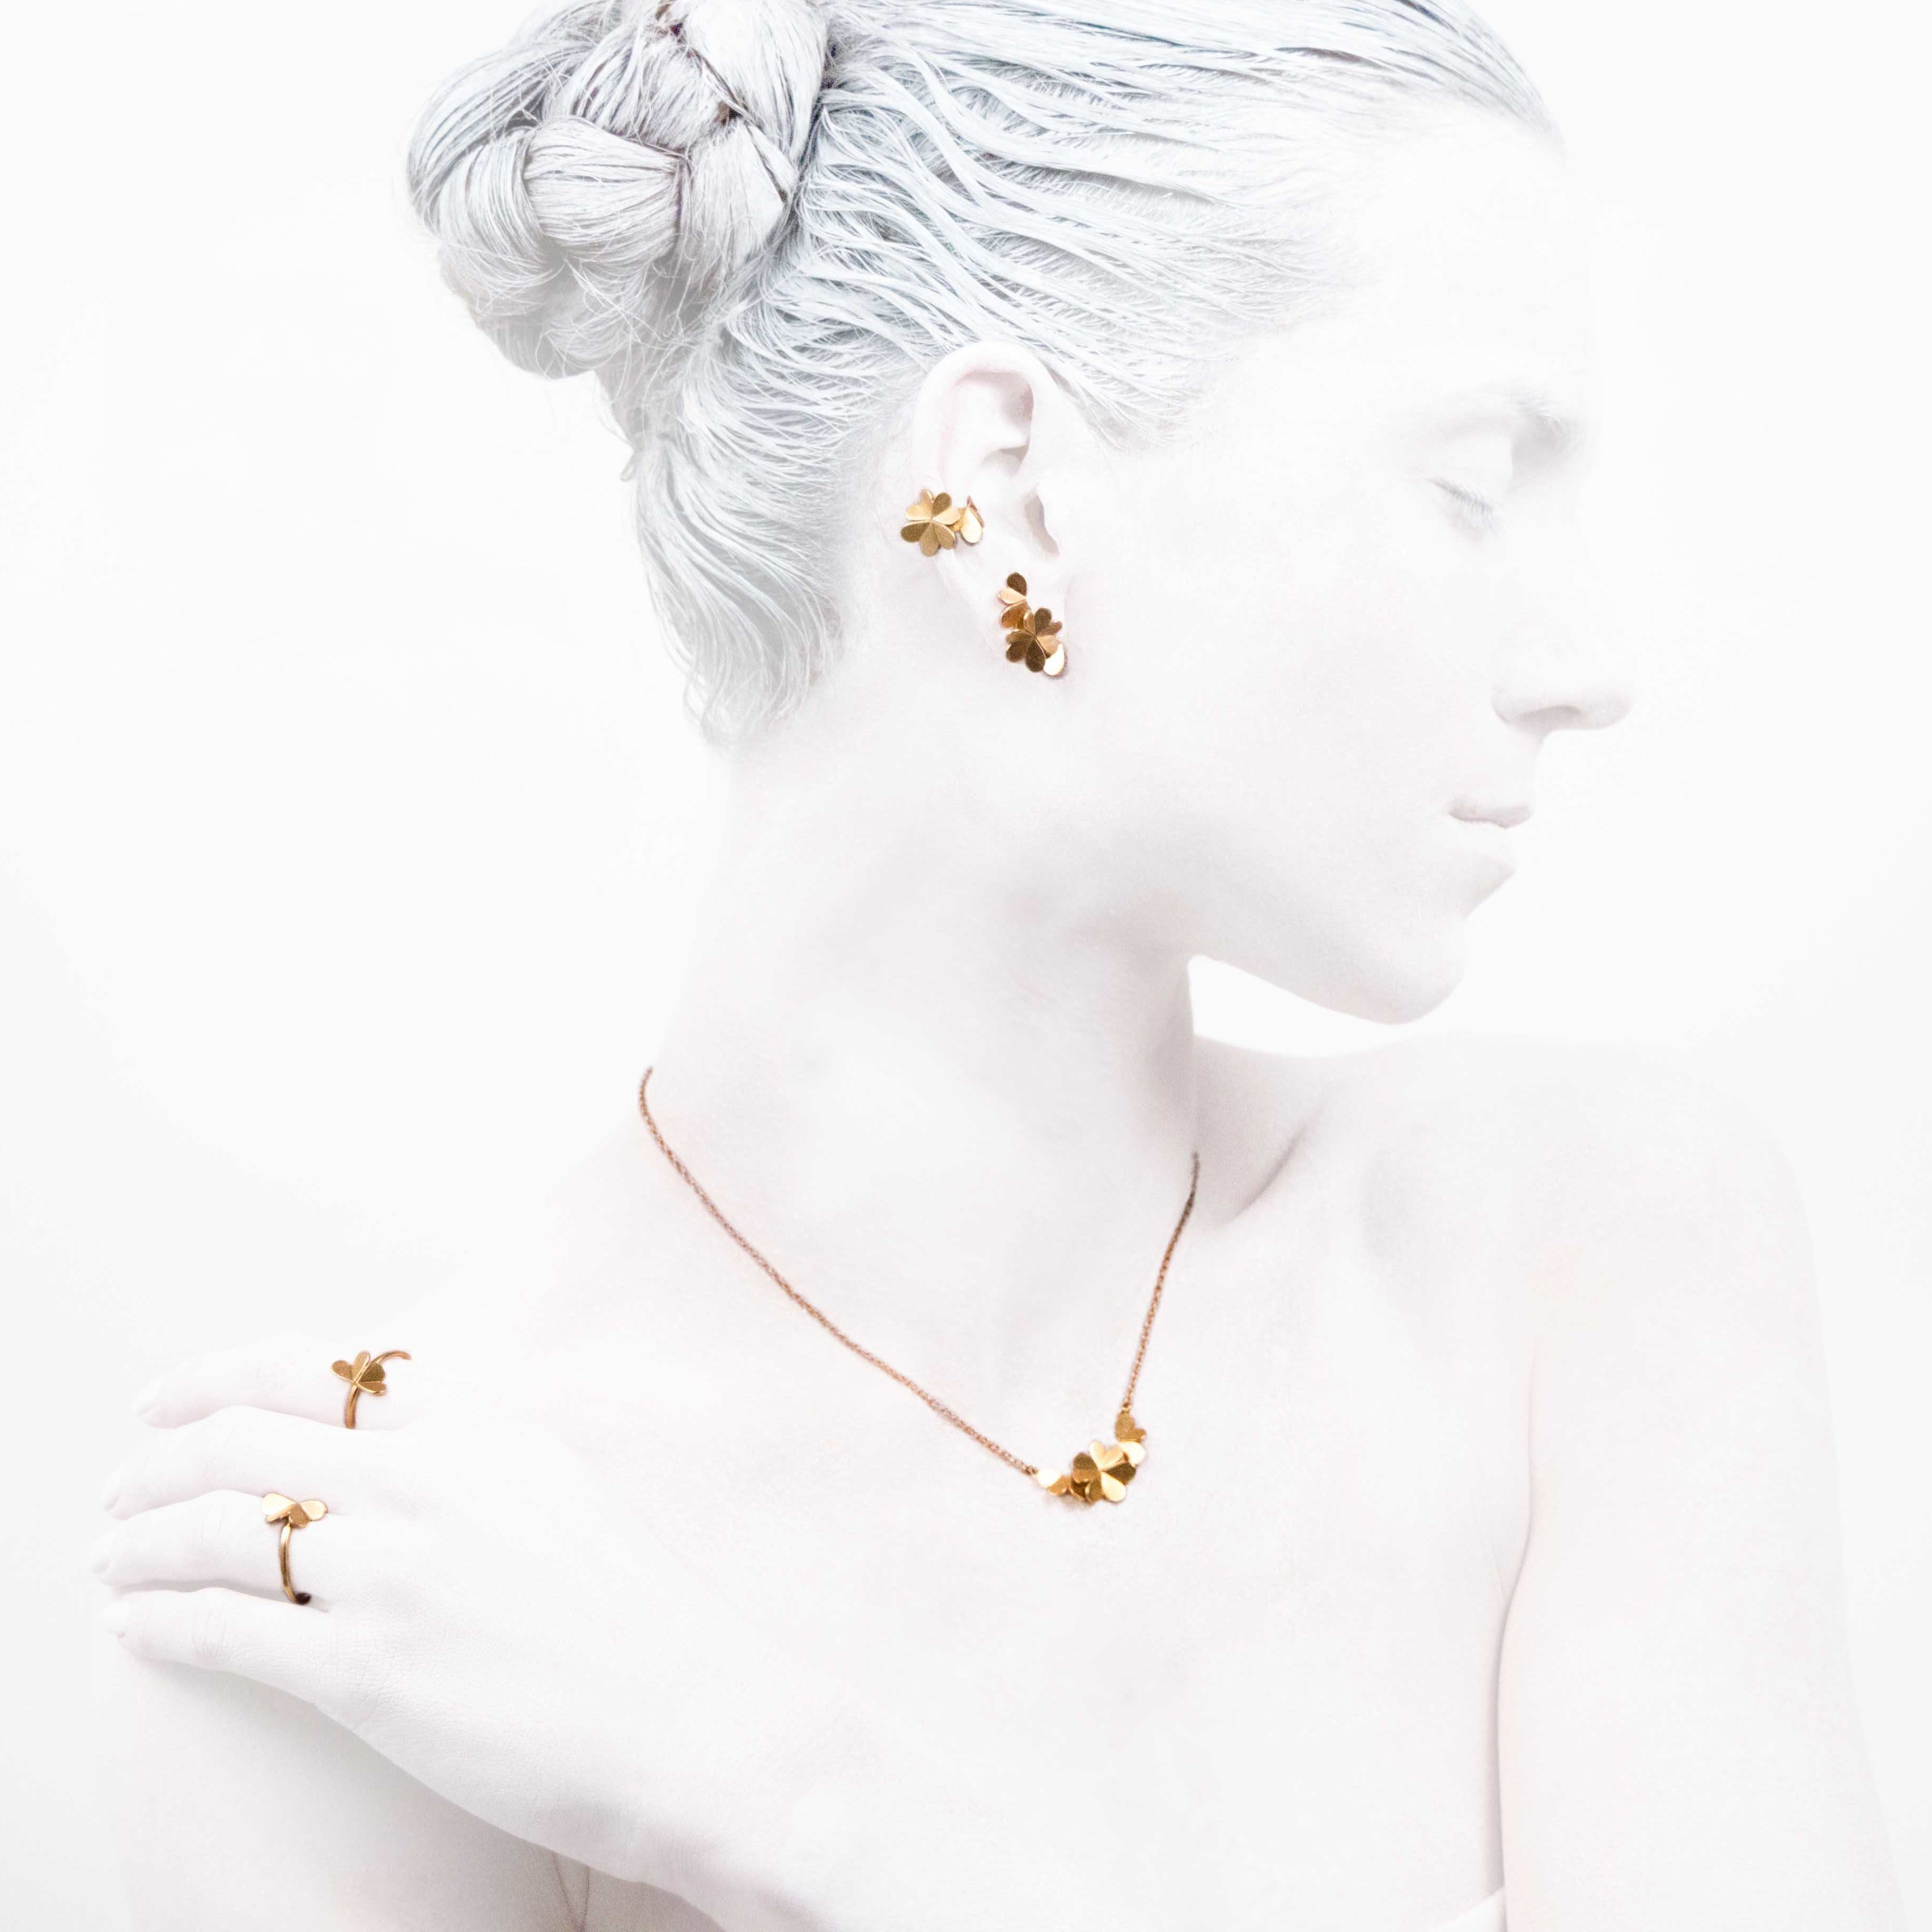 'Elegancy in White' Clover Collection #leifoojewelry #jewelry #jewelryinspirations #fashionphotography #fashionblogger #catwalkavenuebyandrea #PhotographybyMichaelaVallachova #Artistic #awesomework #Geisha